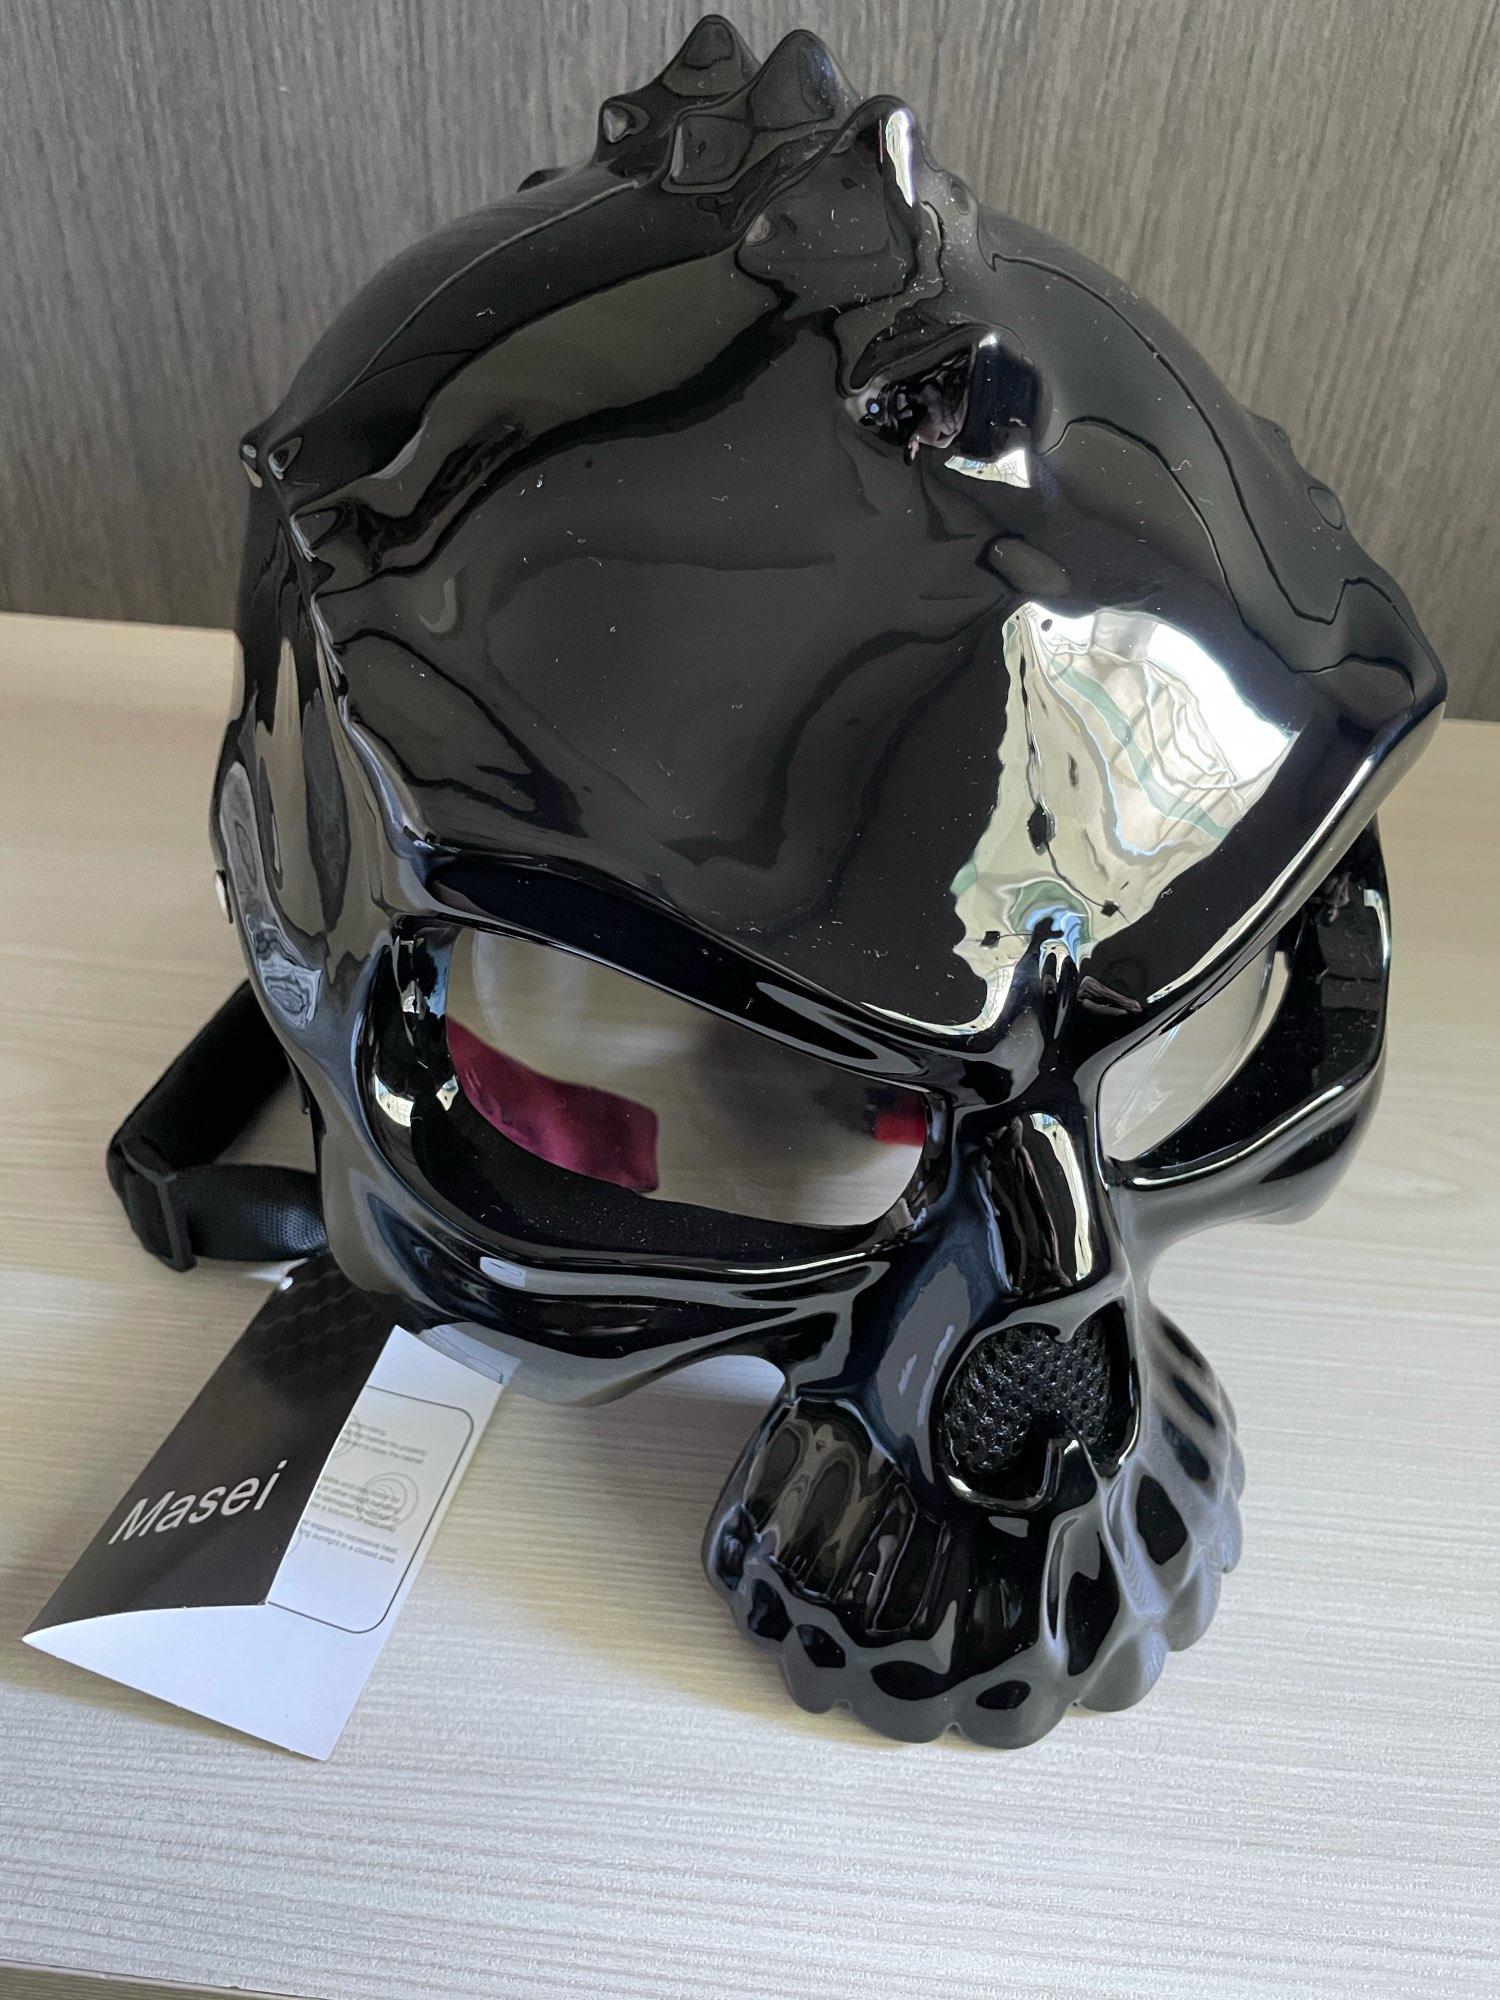 Masei 15 color 489 Dual Use Skull Motorcycle Helmet Capacete Casco Novelty Retro Casque Motorbike Half Face Helmet free shipping|skull motorcycle helmet|face helmethalf face helmet - AliExpress